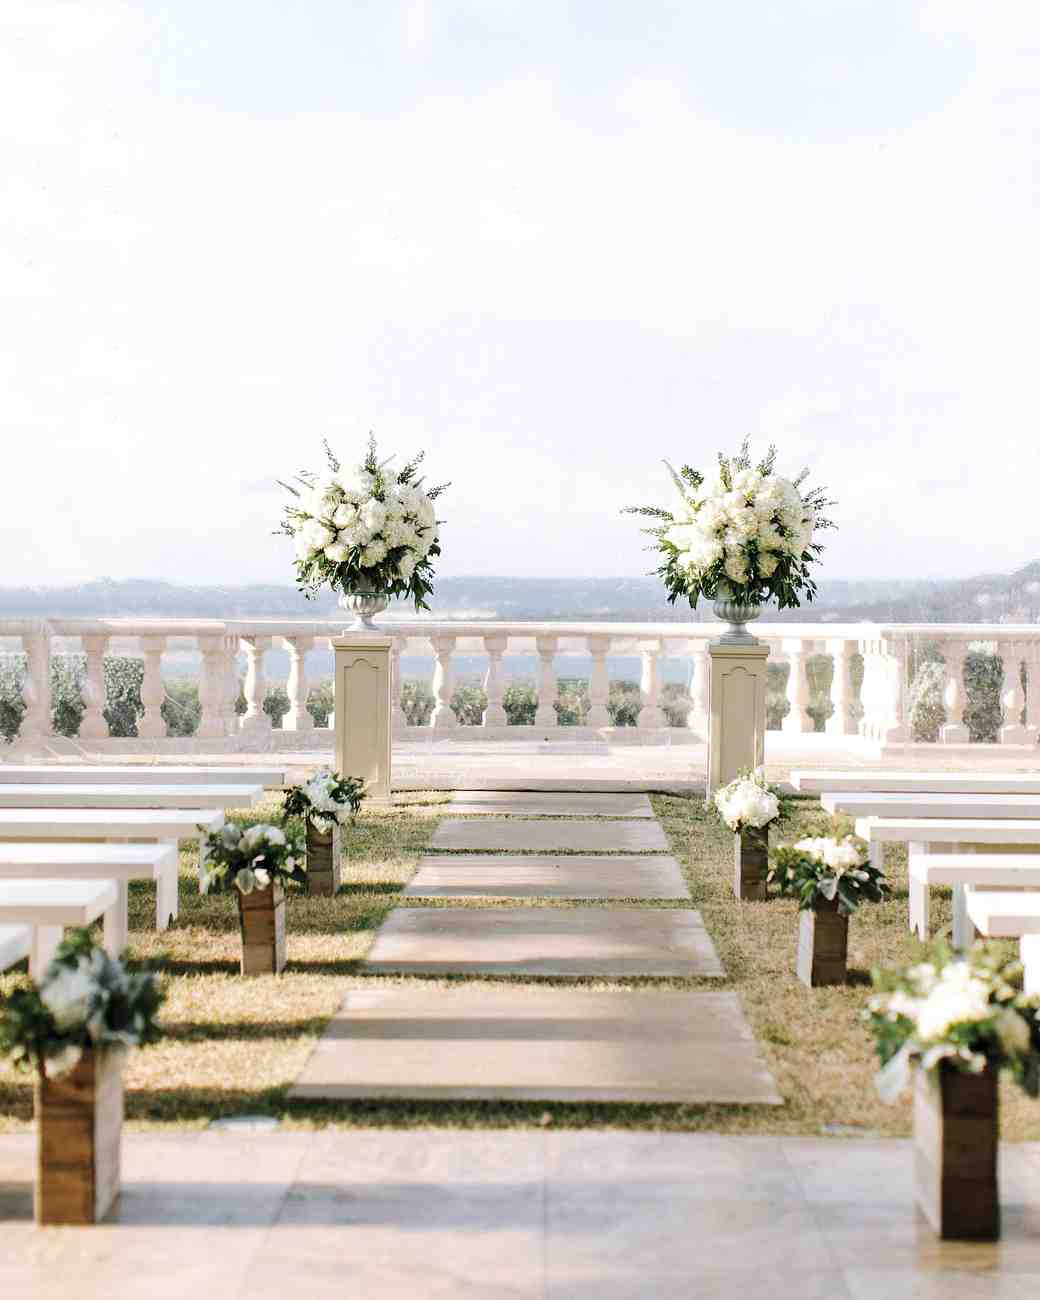 mmallory-diego-wedding-texas-location-at-the-altar-077-s112628.jpg